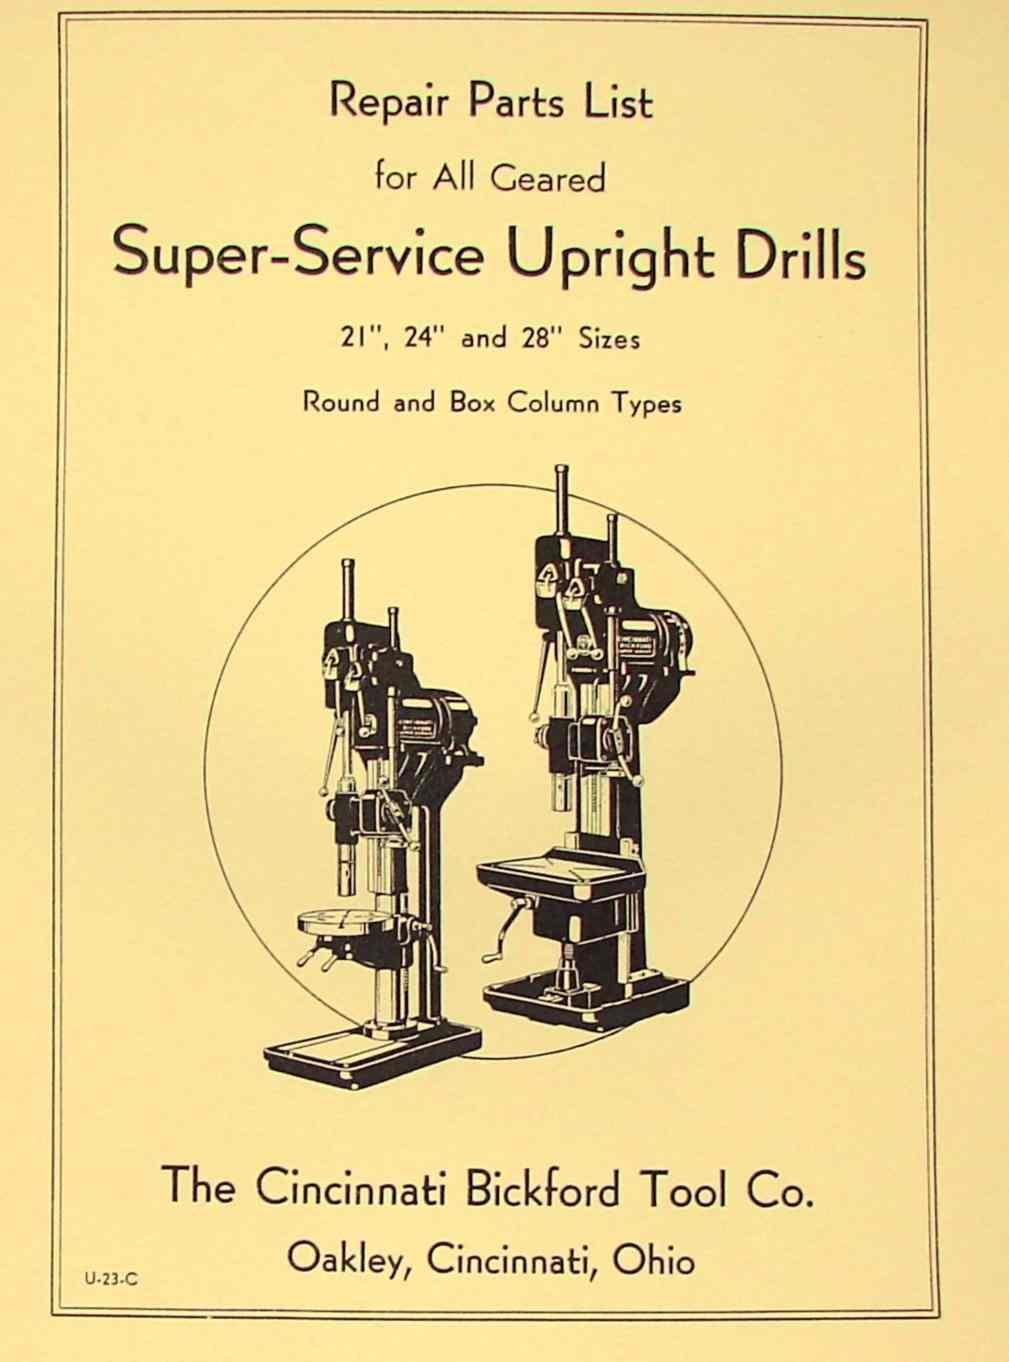 cincinnati bickford 21 24 28 super service upright drills parts rh ozarktoolmanuals com Cincinnati Radial Arm Drill Press Cincinnati Bickford Drill Press